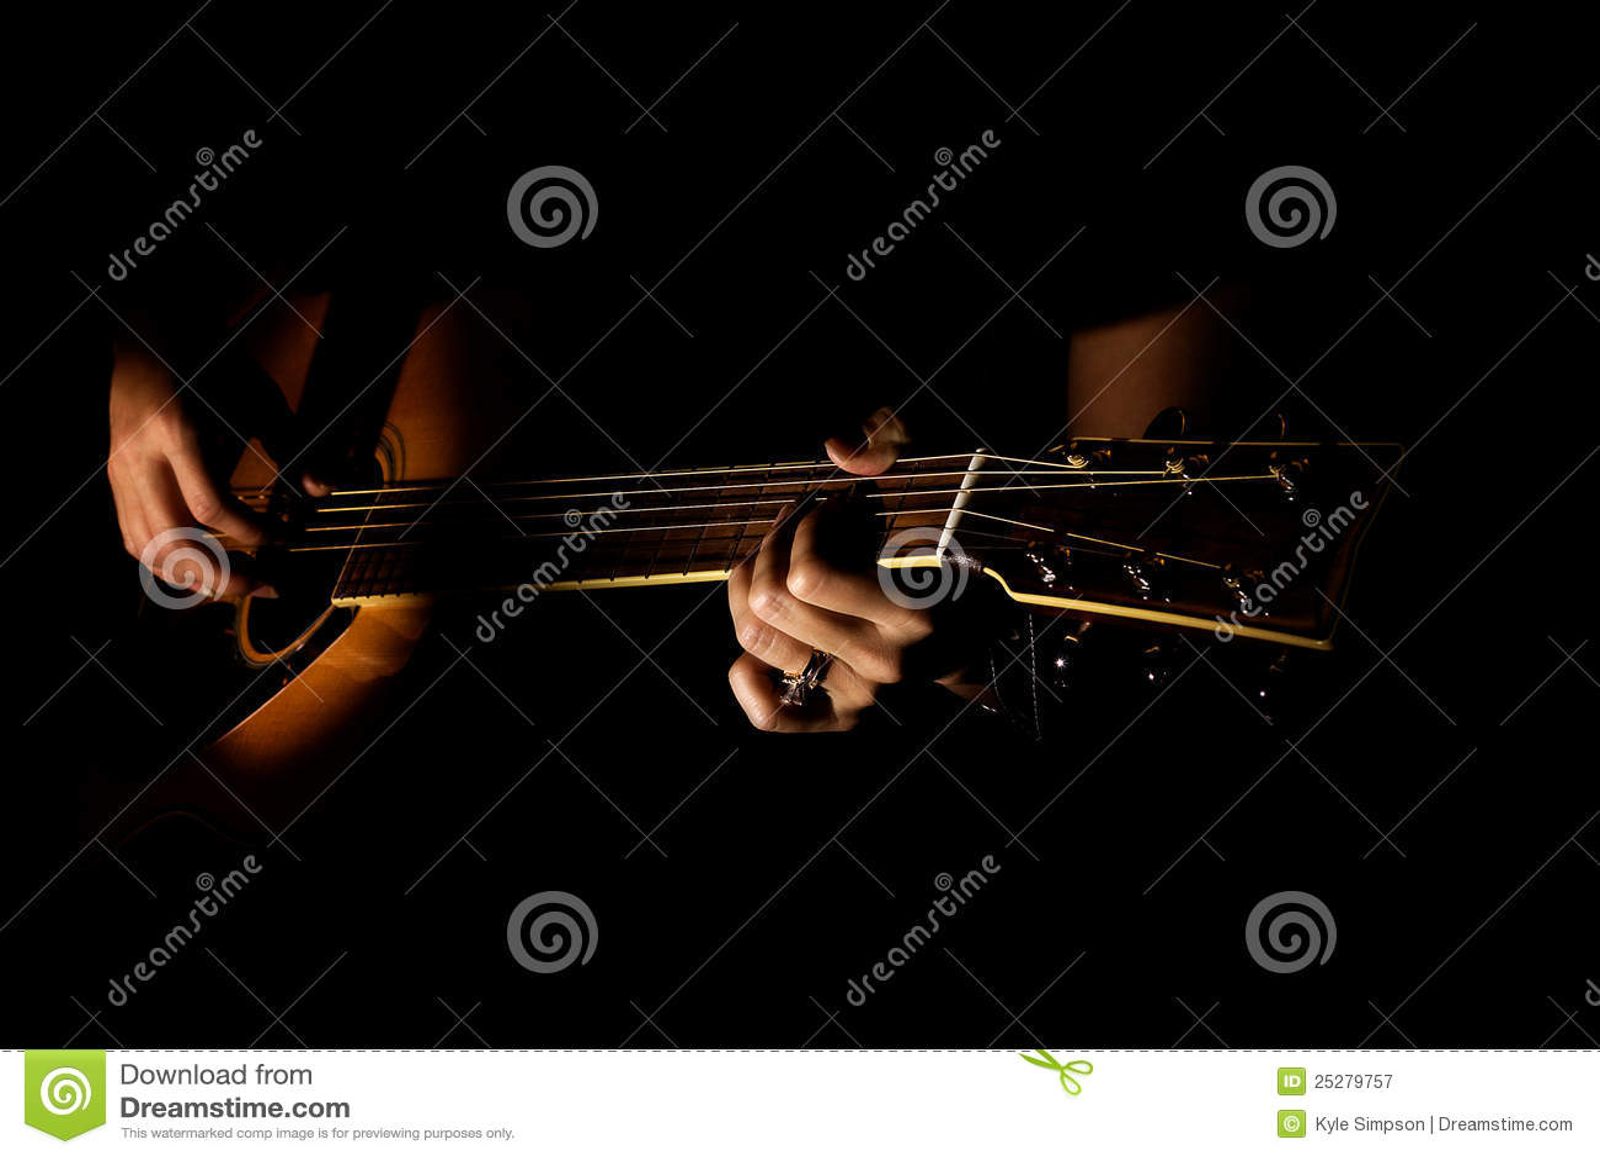 Download Guitar stock image. Image of tuning, guitar, fingering - 25279757